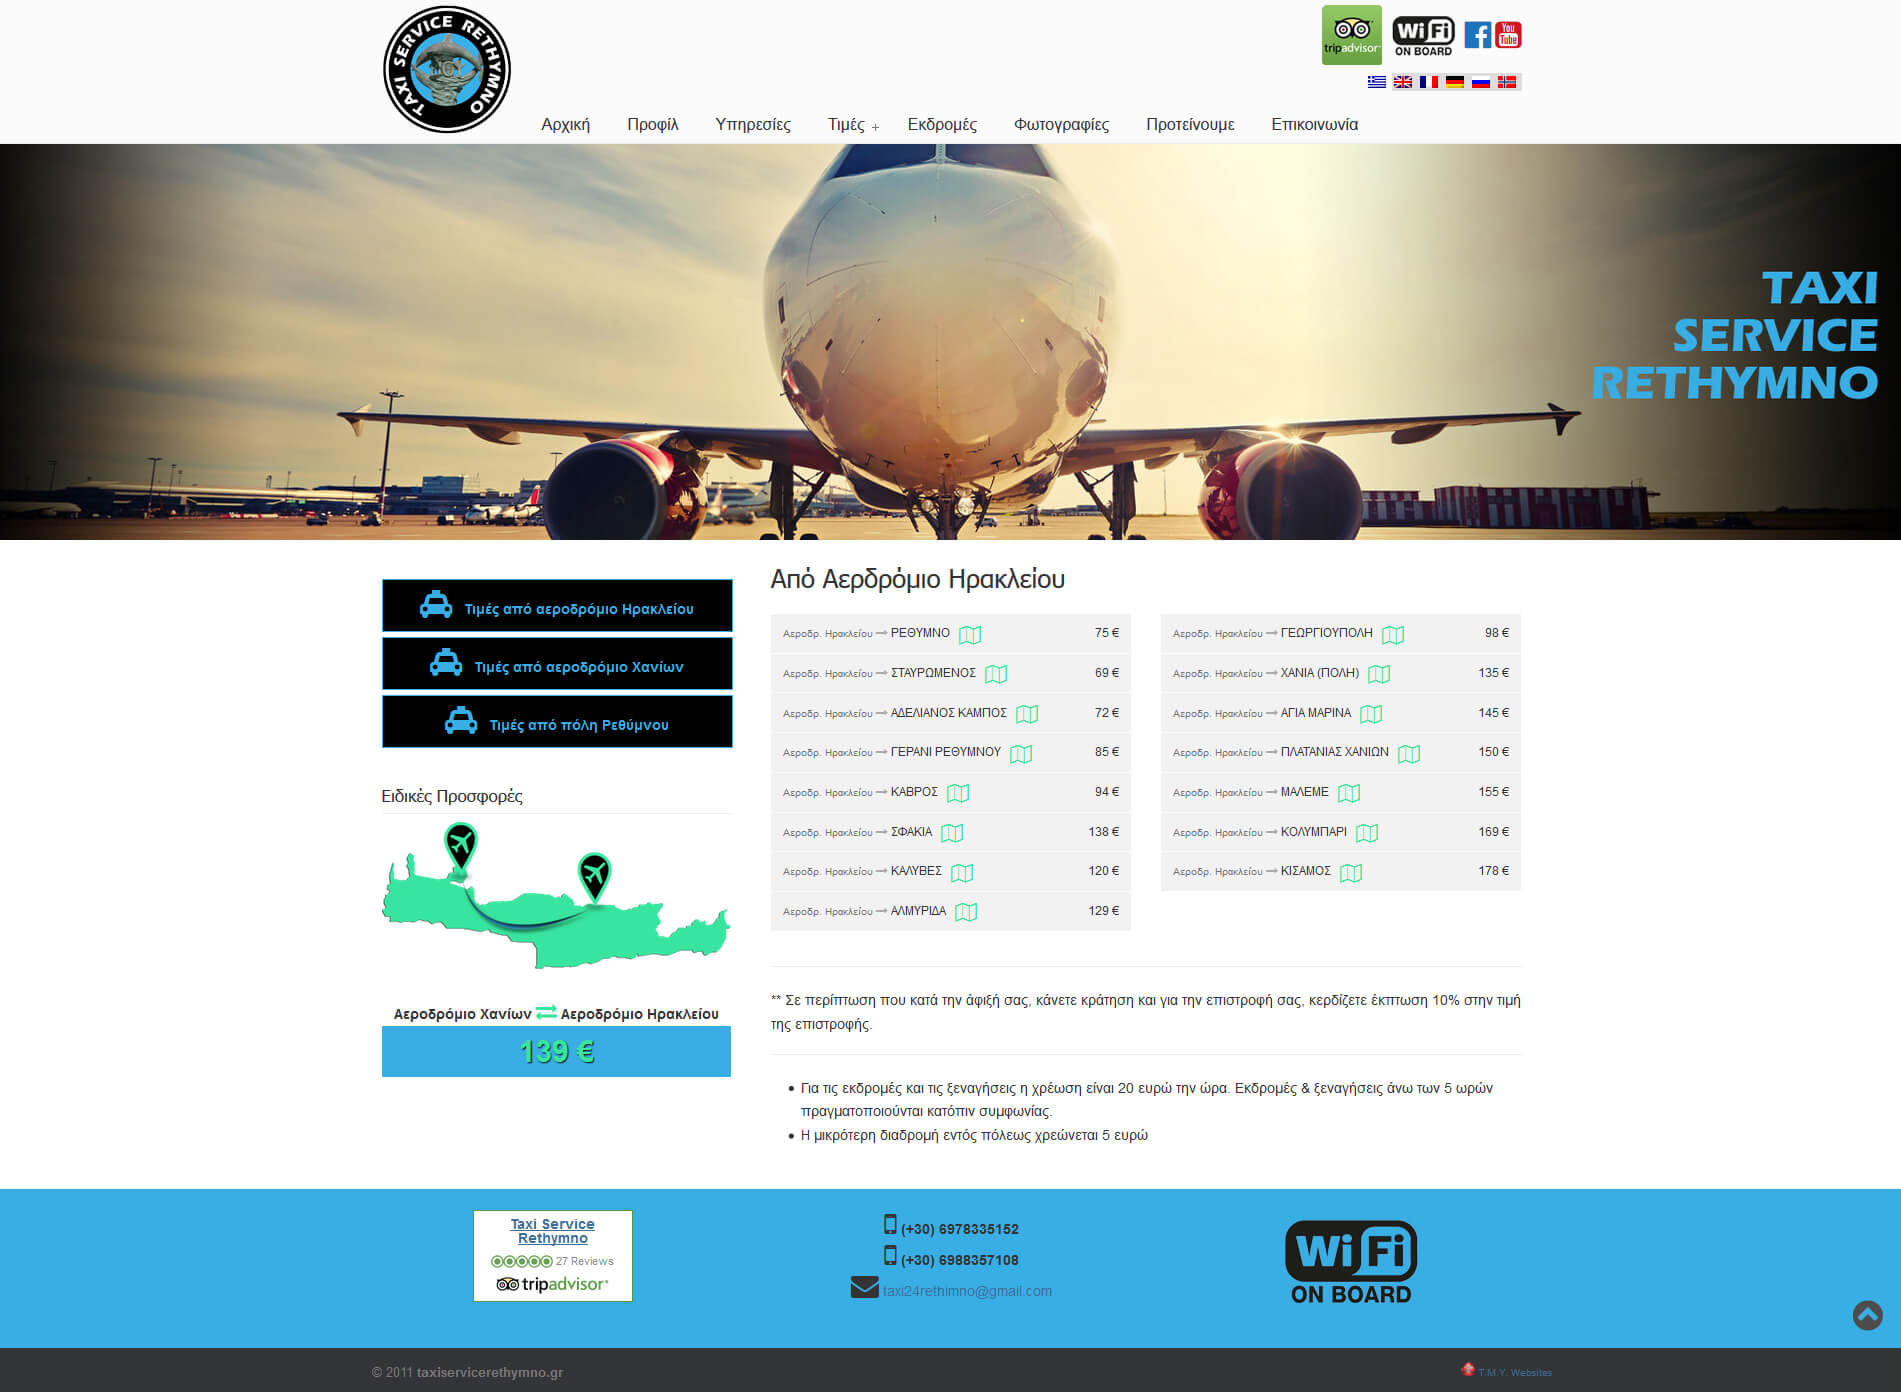 Taxi Service Rethymno - TMY WEB Development